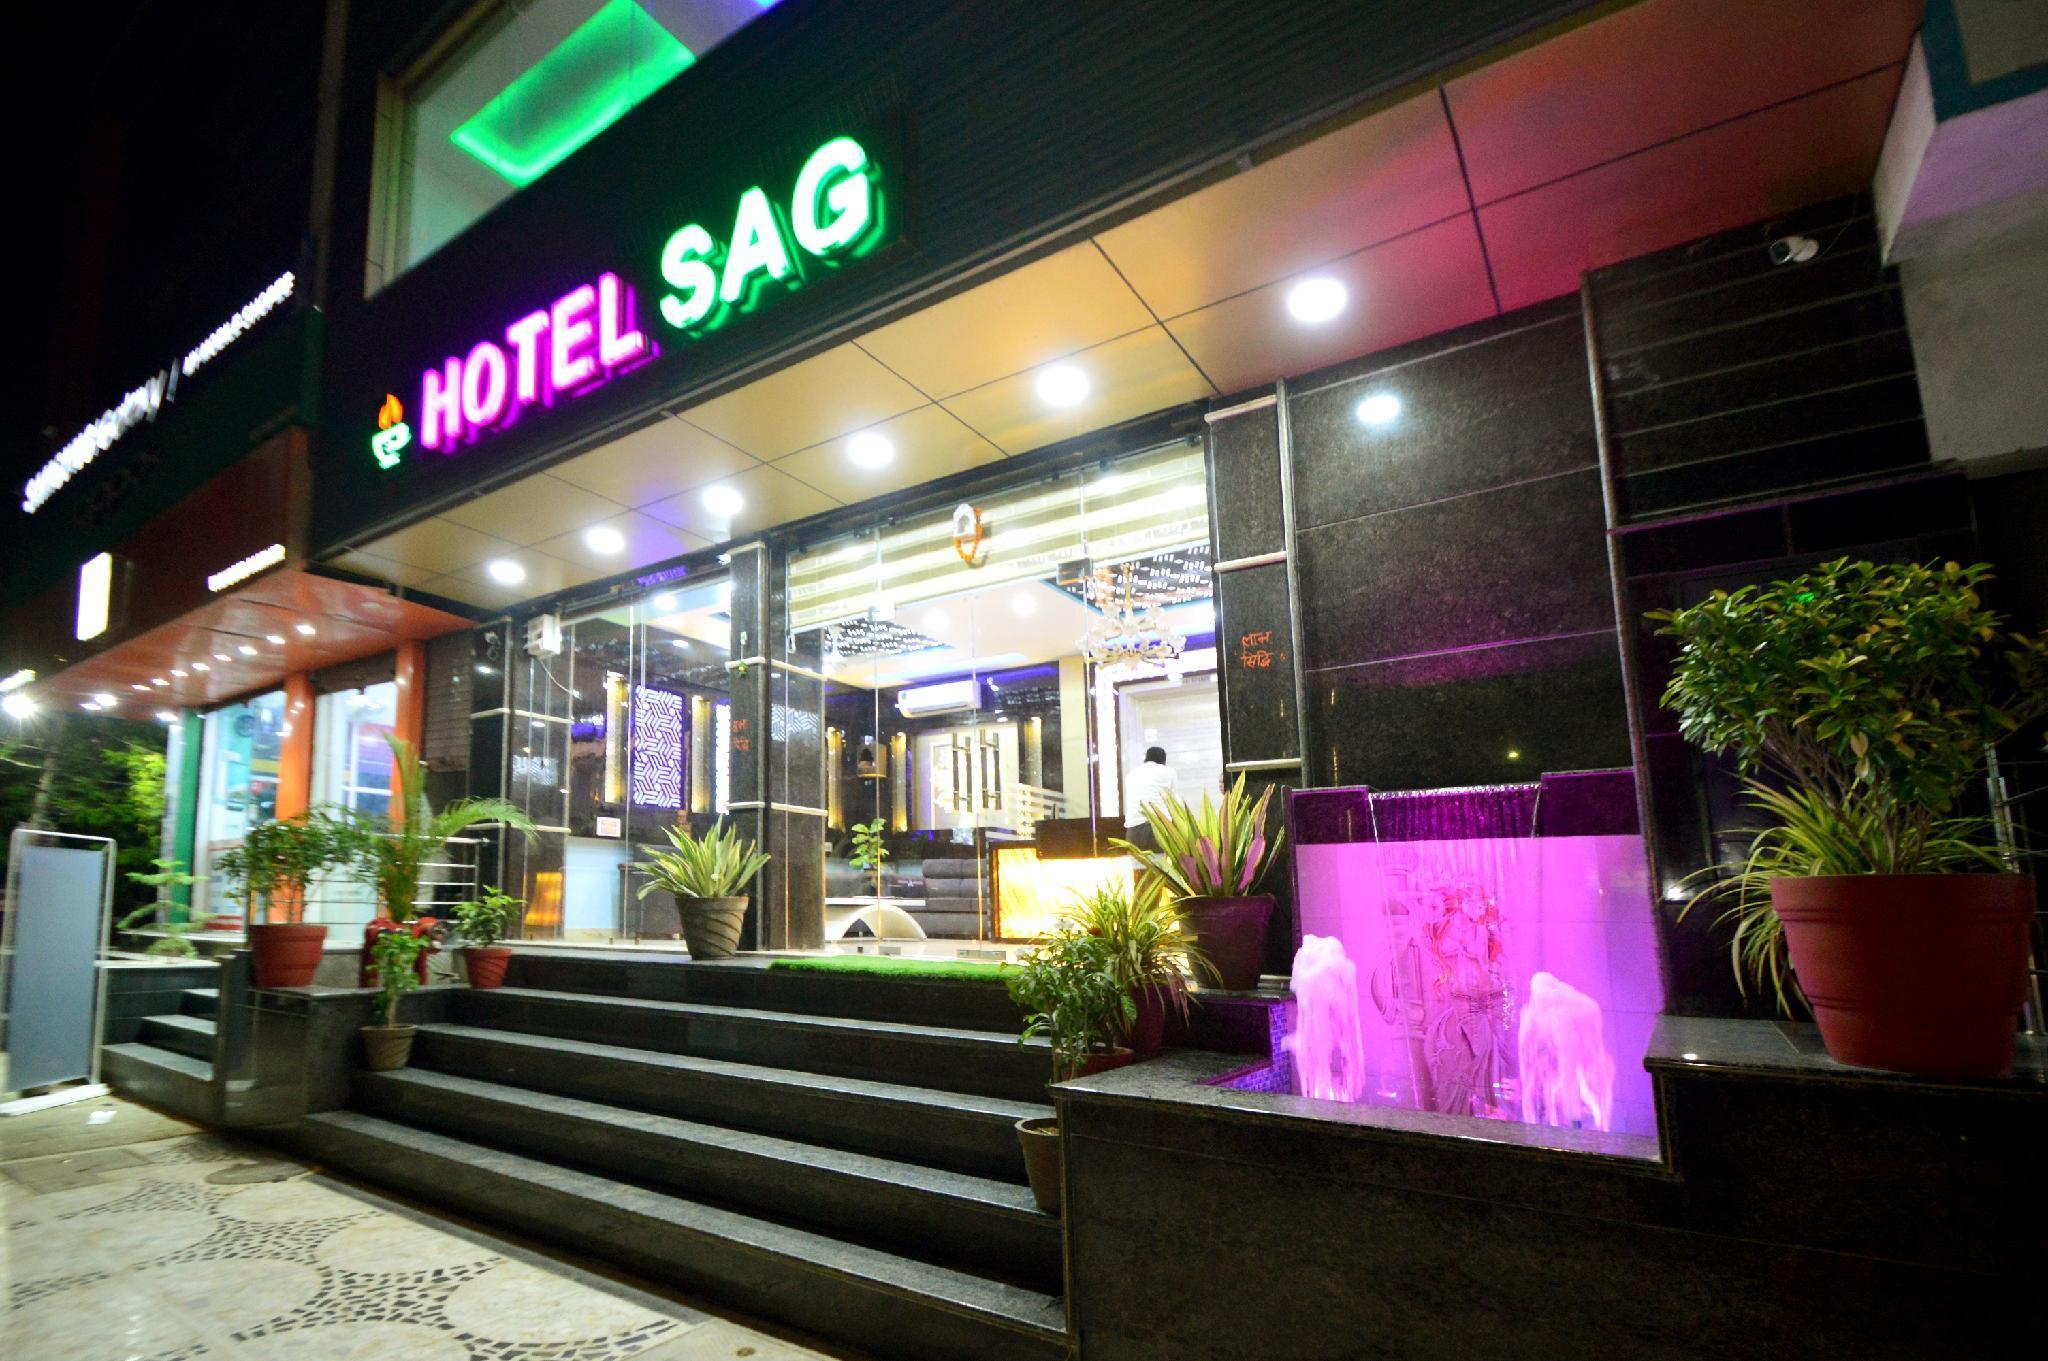 Hotel SAG